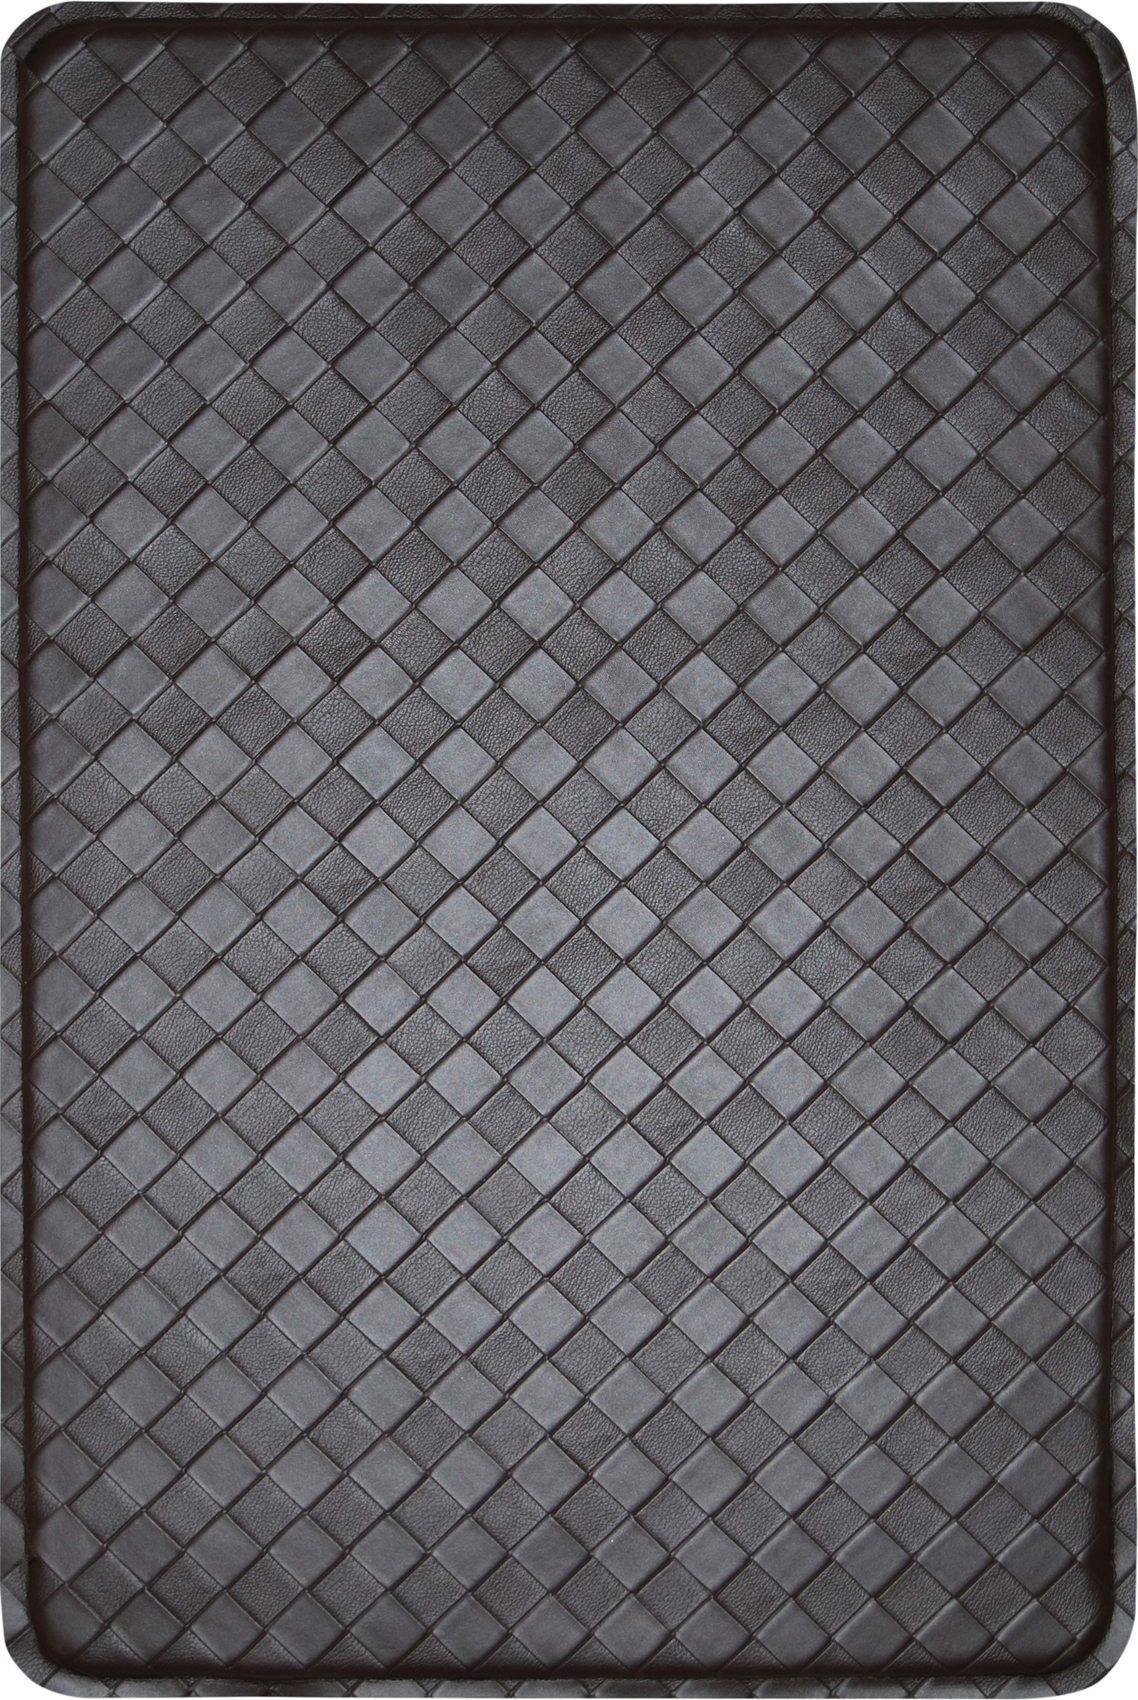 Contemporary-Indoor-Cushion-Kitchen-Rug-Anti-Fatigue-Floor-Mat-Actual-24-x-36